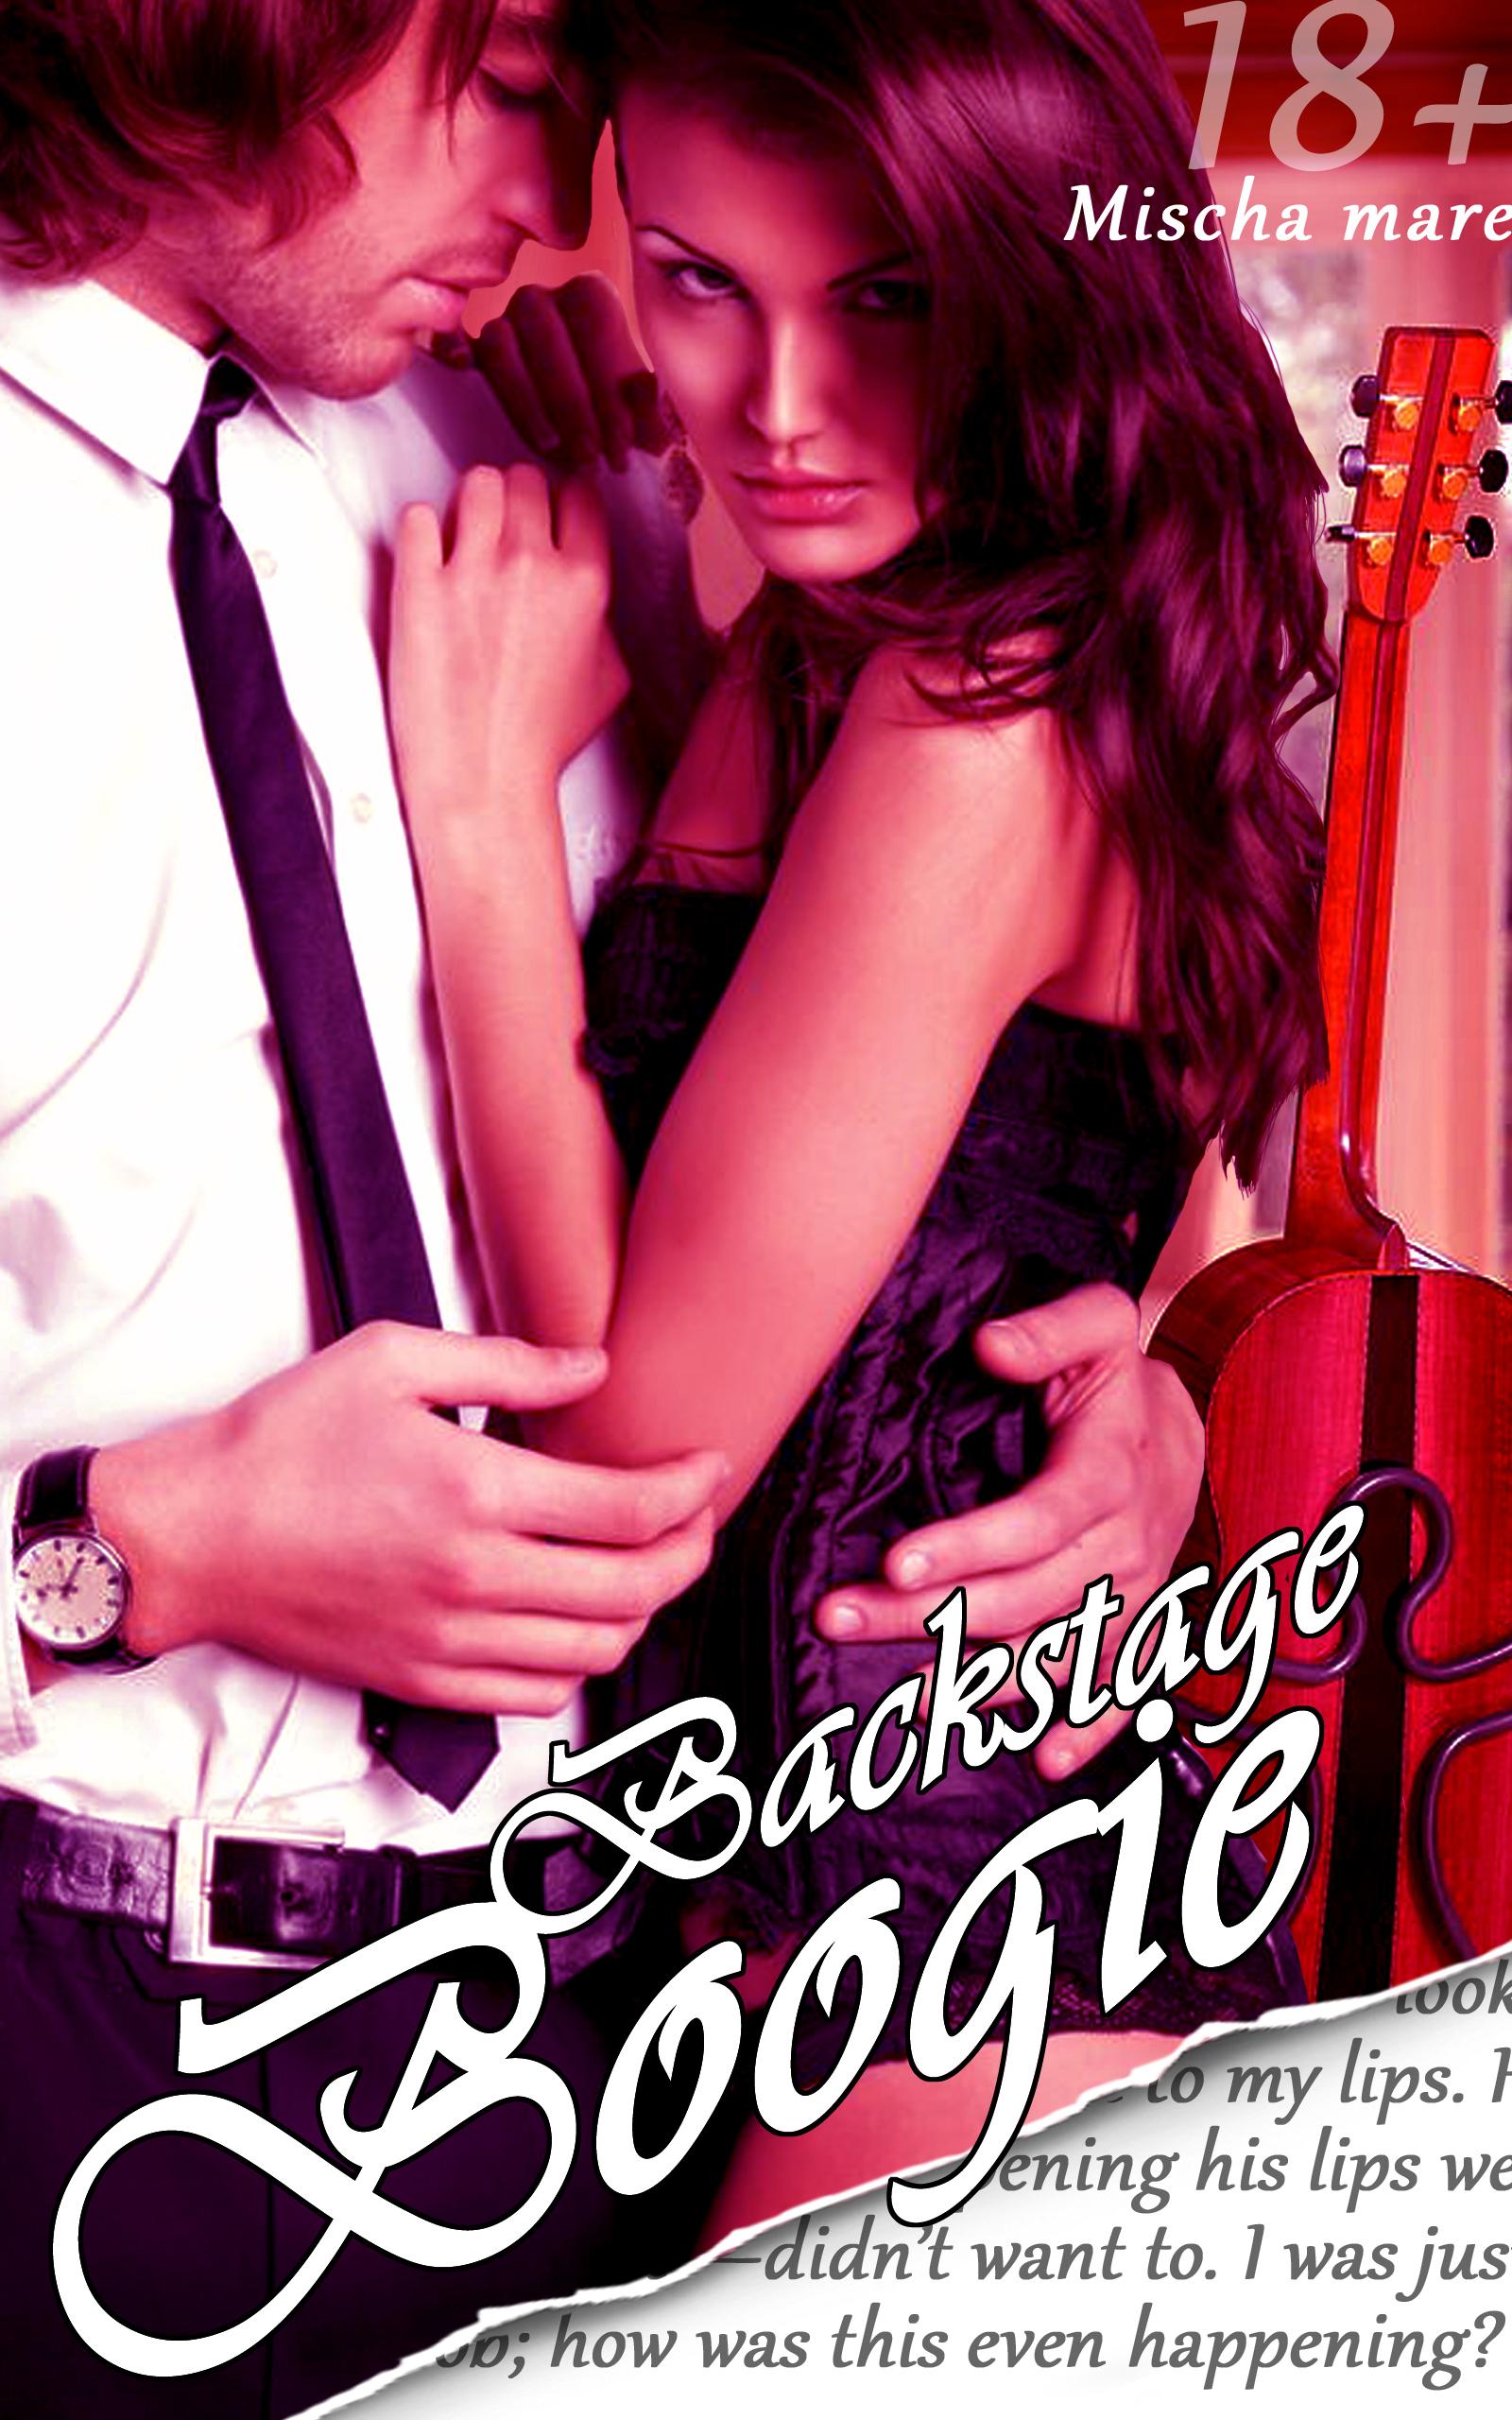 Mischa Mare - Backstage Boogie (Rock Star Lovers Series)